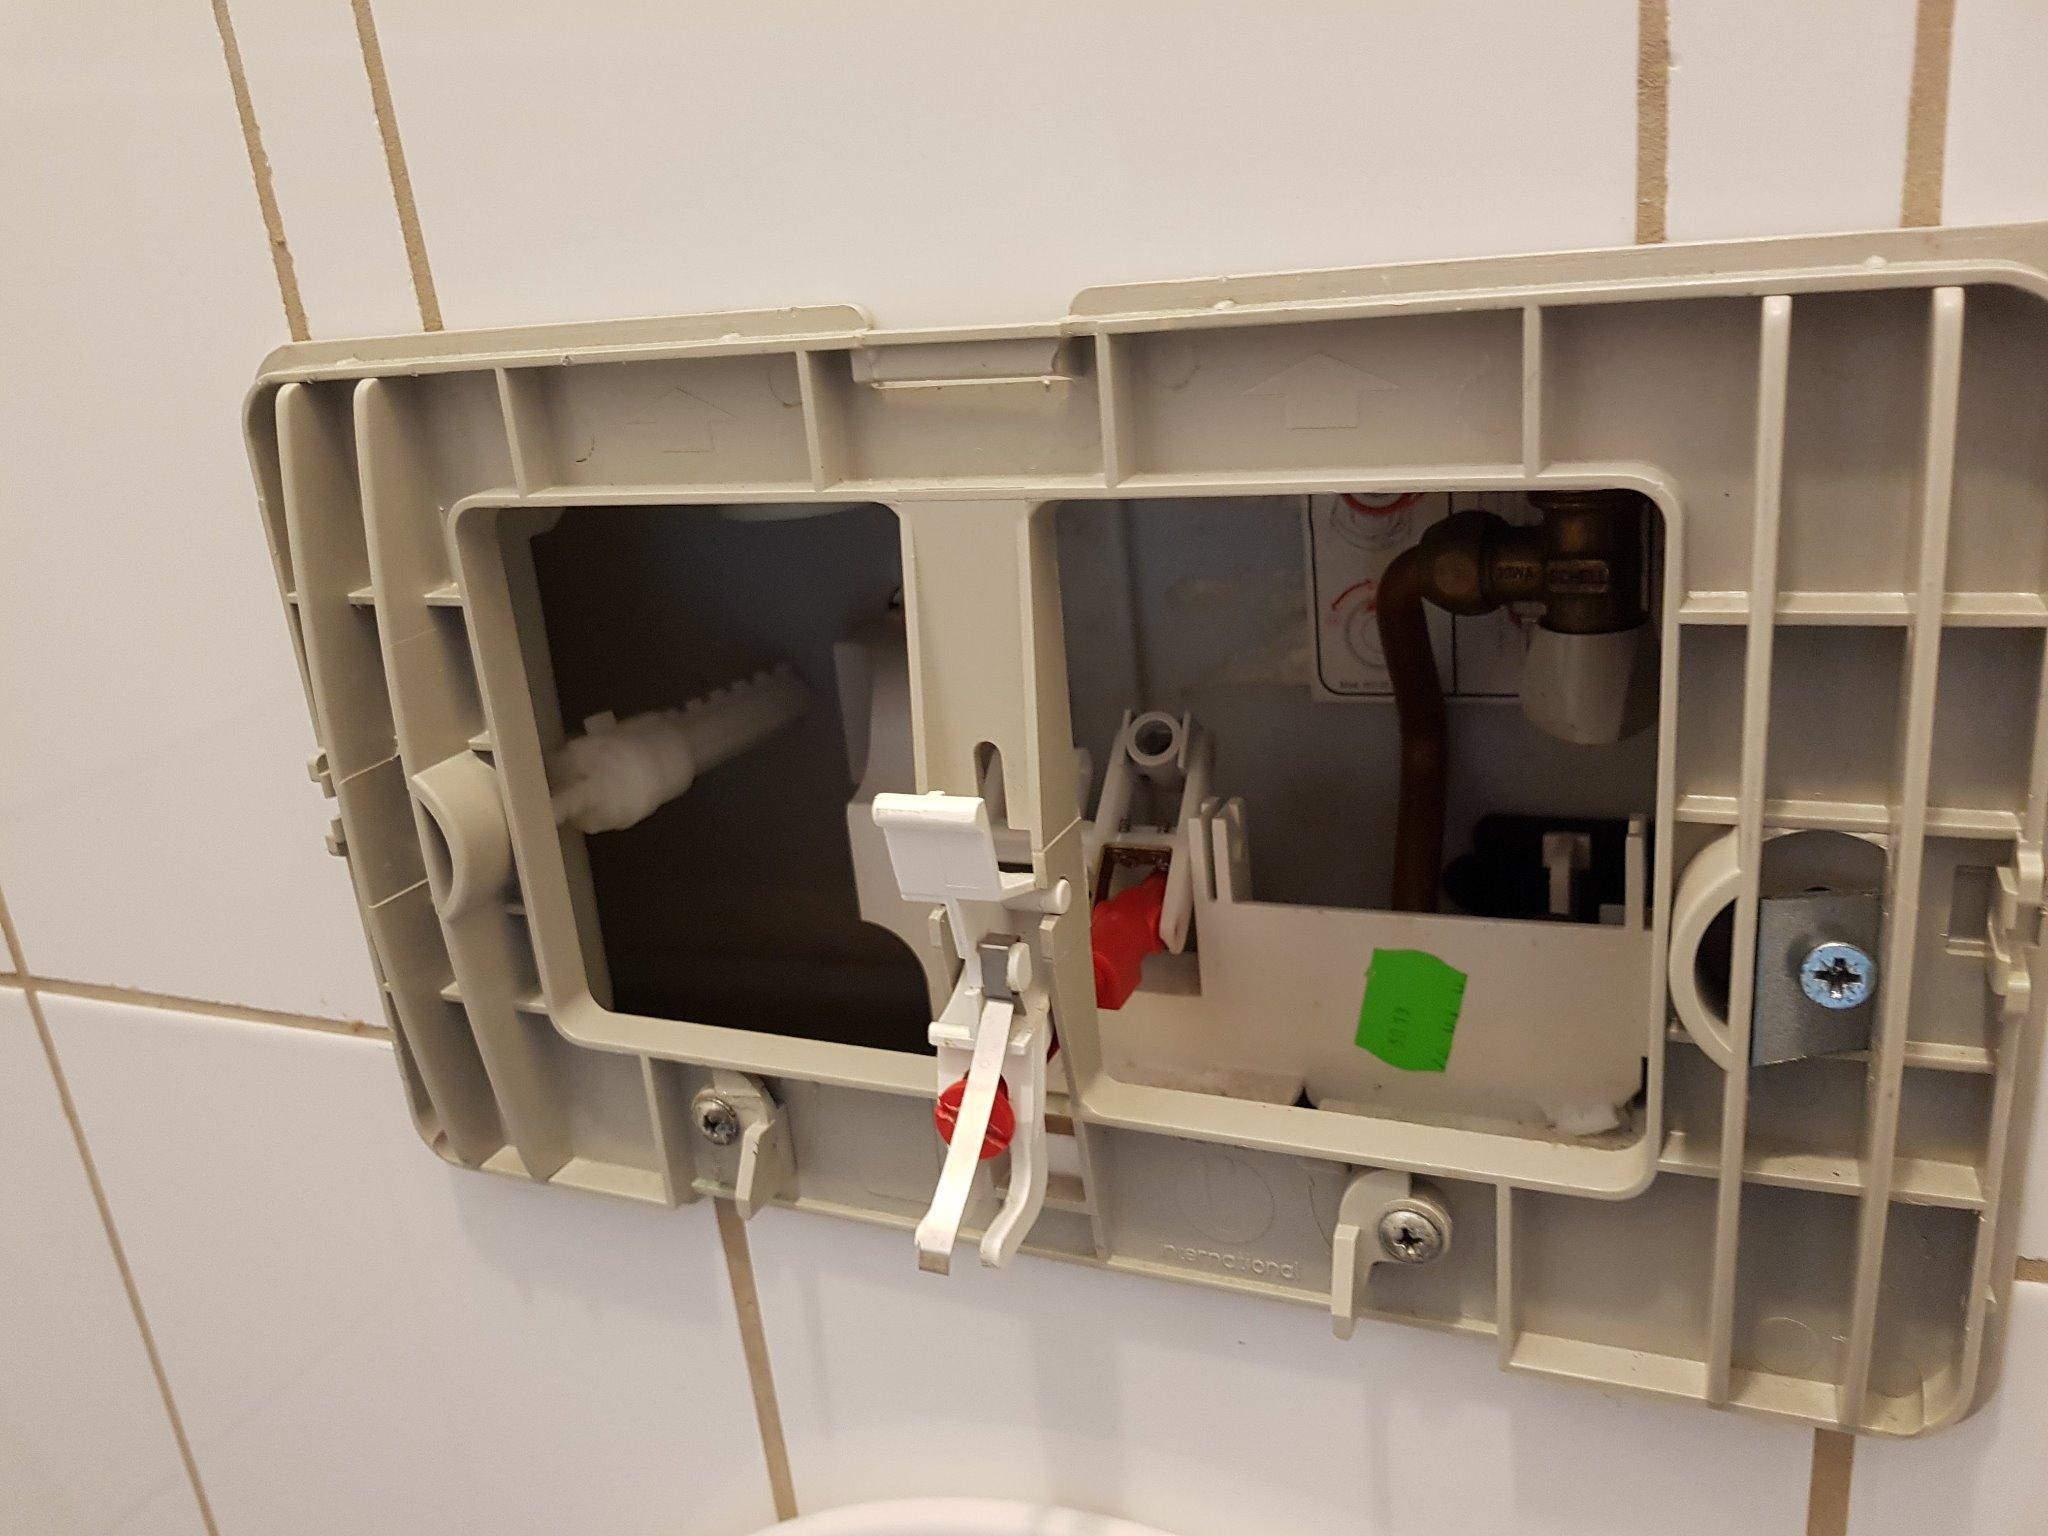 Binnenwerk Spoelbak Toilet : Vervangen binnenwerk oliver international zwevend toilet werkspot